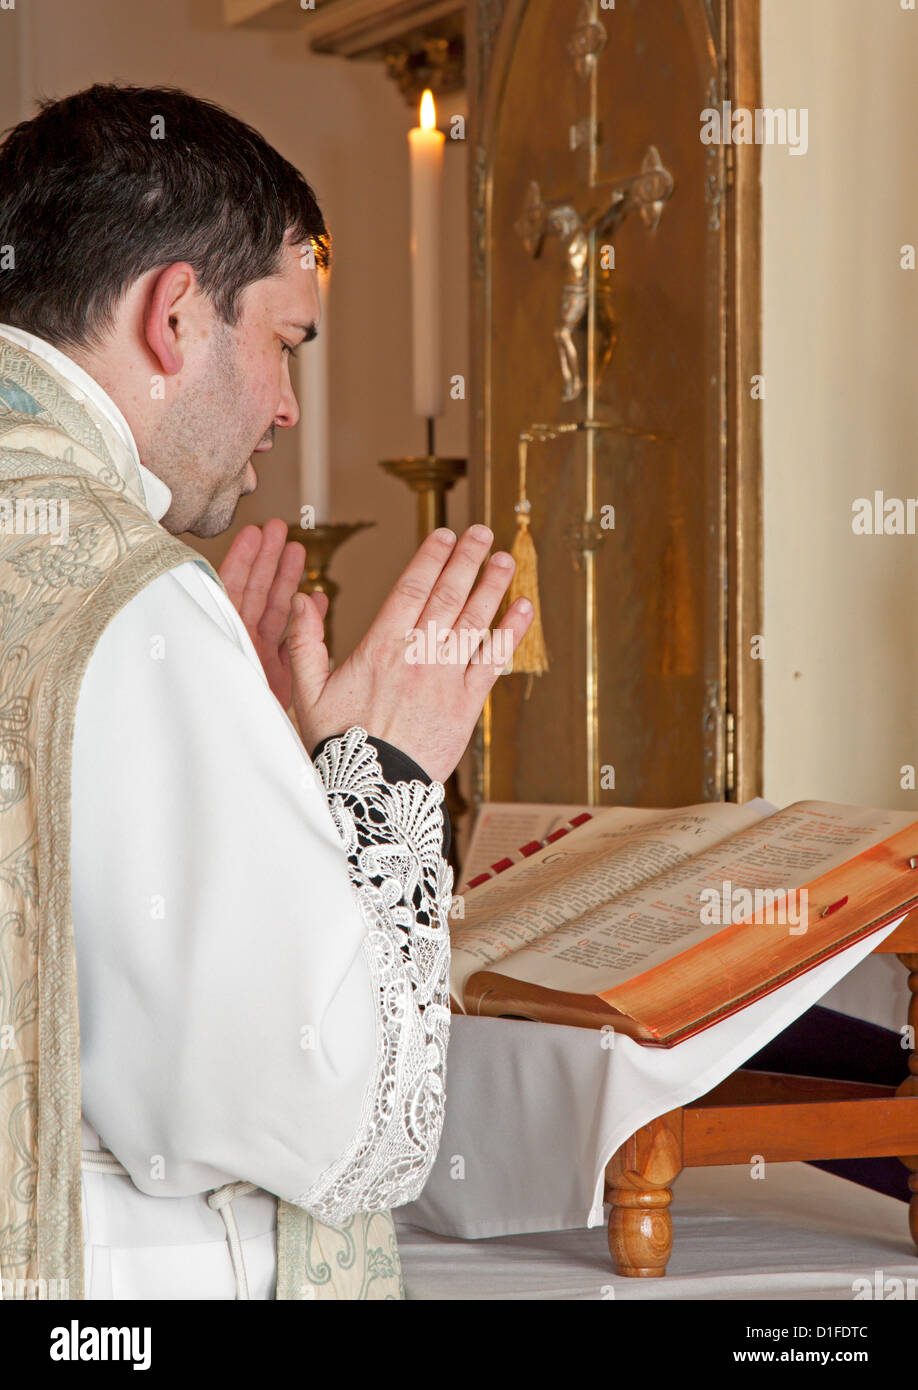 catholic priest at tridentine mass - Stock Image